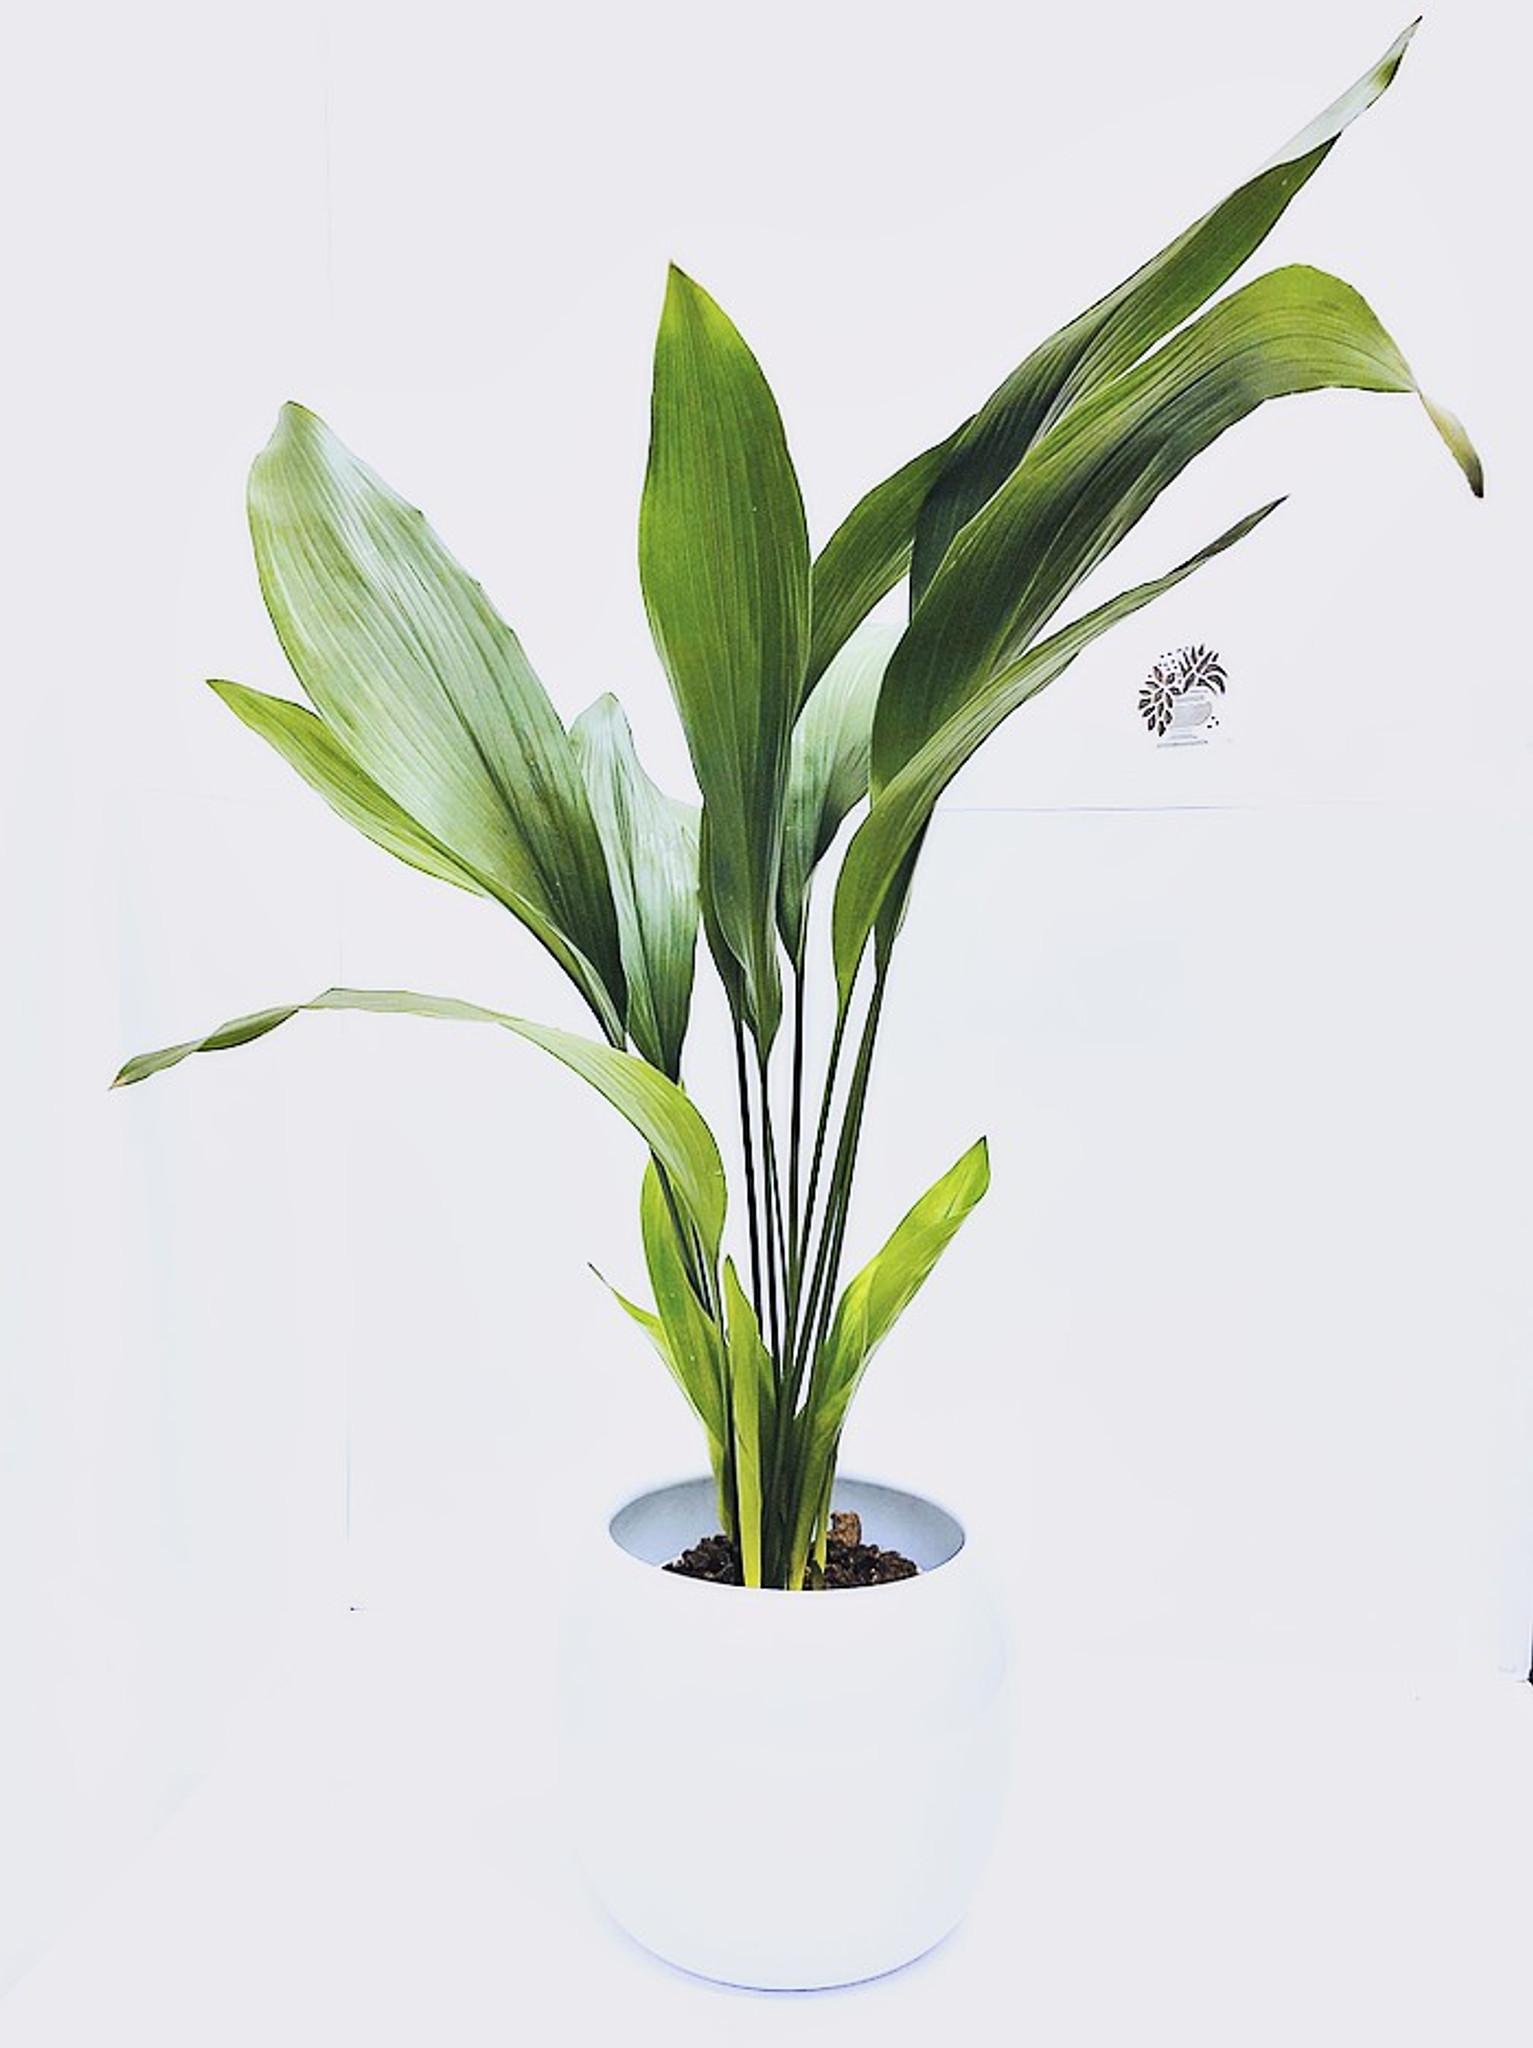 XL Aspidistra plant in a quality ceramic glazed planter.